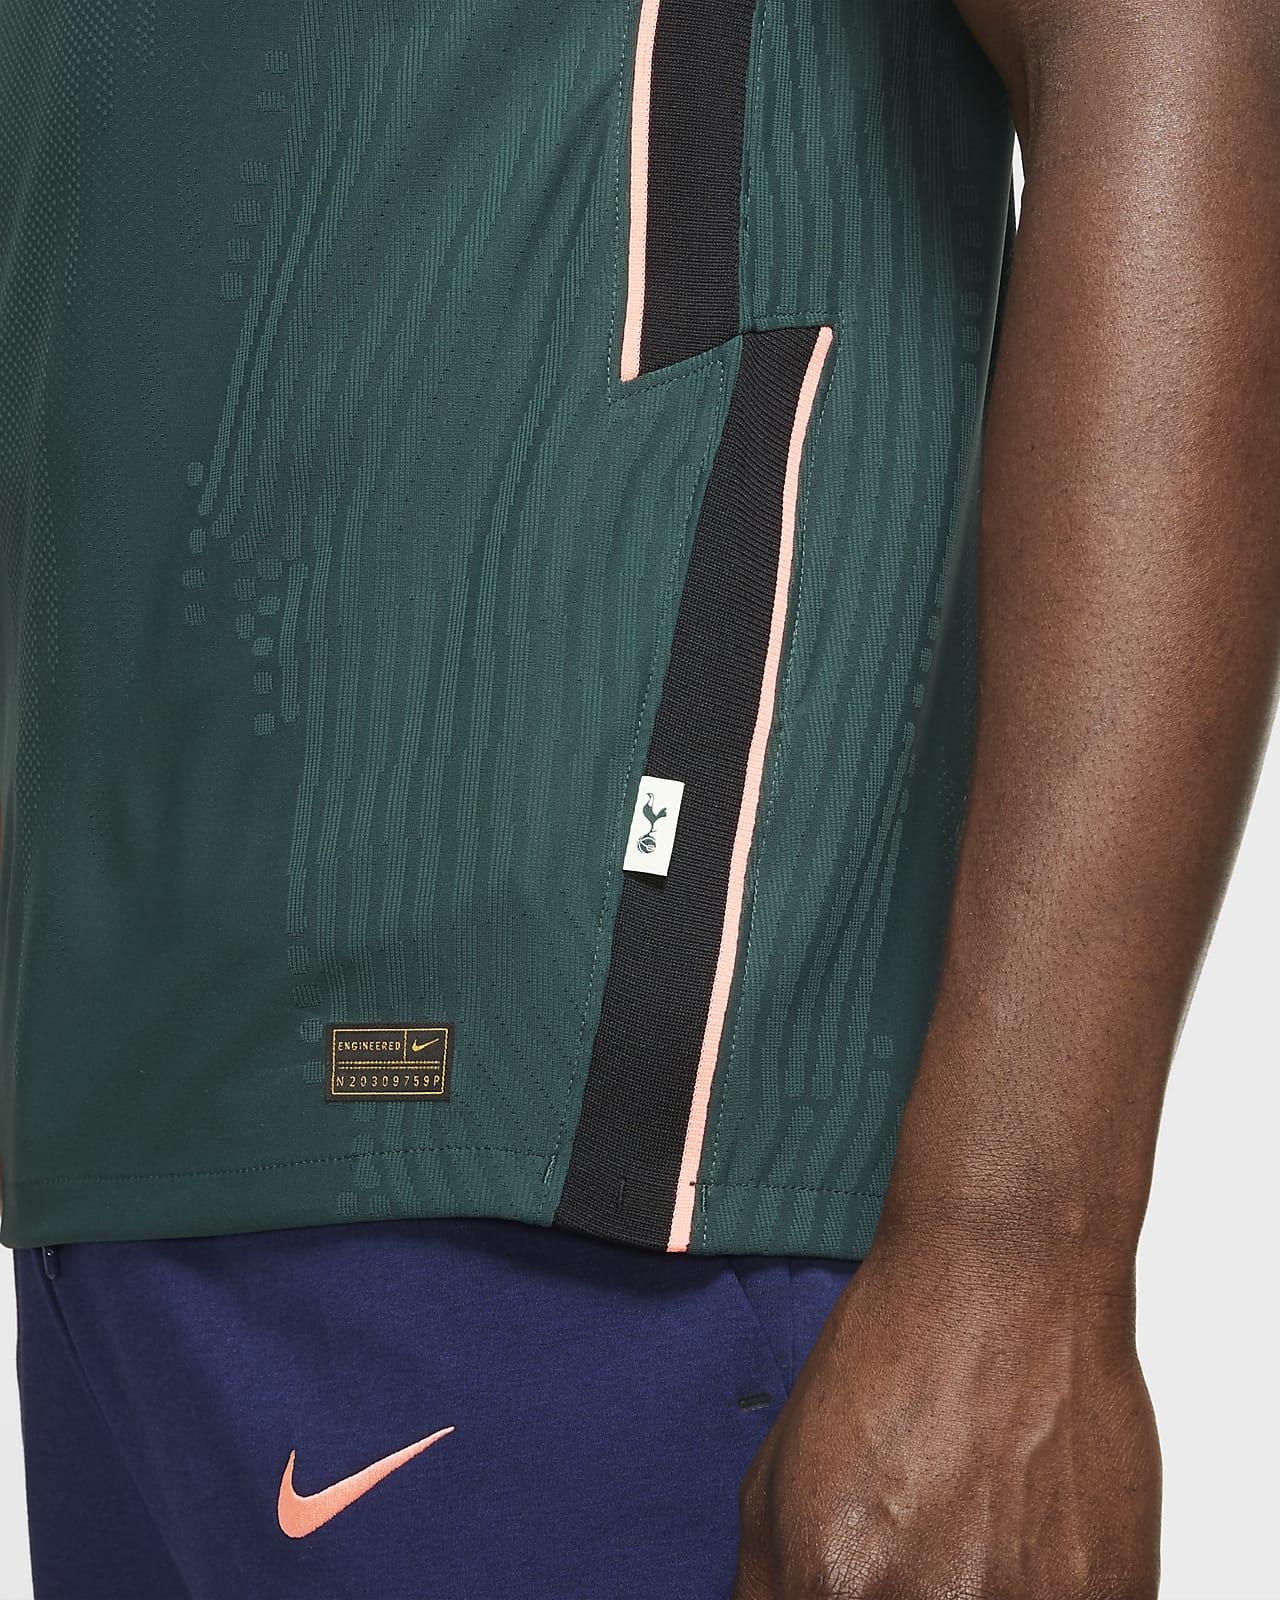 Tottenham Hotspur 2020 21 Nike Away Kit 20 21 Kits Football Shirt Blog